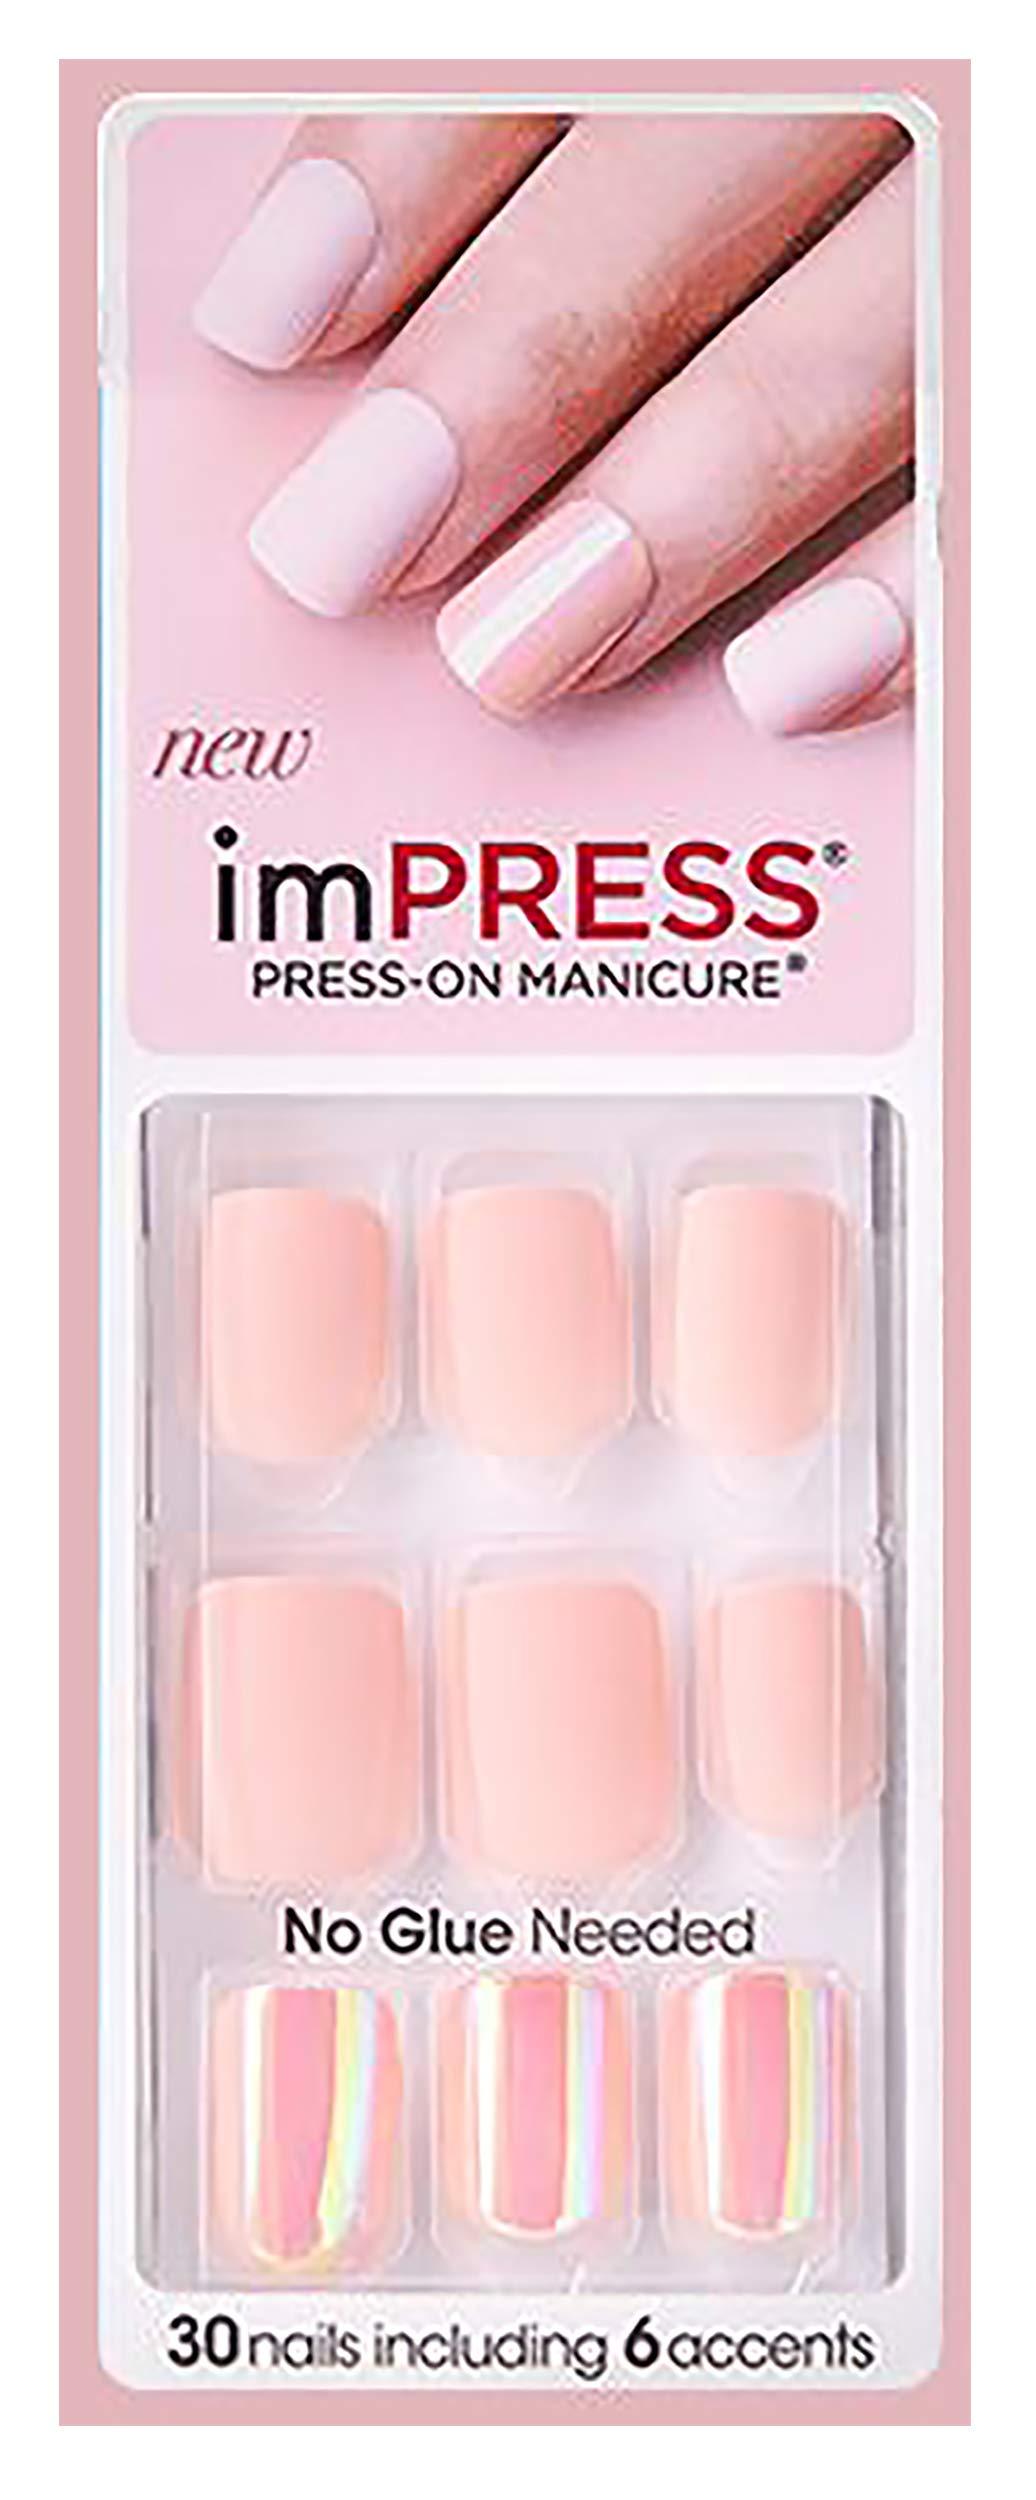 Kiss imPRESS SO SO STELLAR Short Length Press-On Nails by Broadway